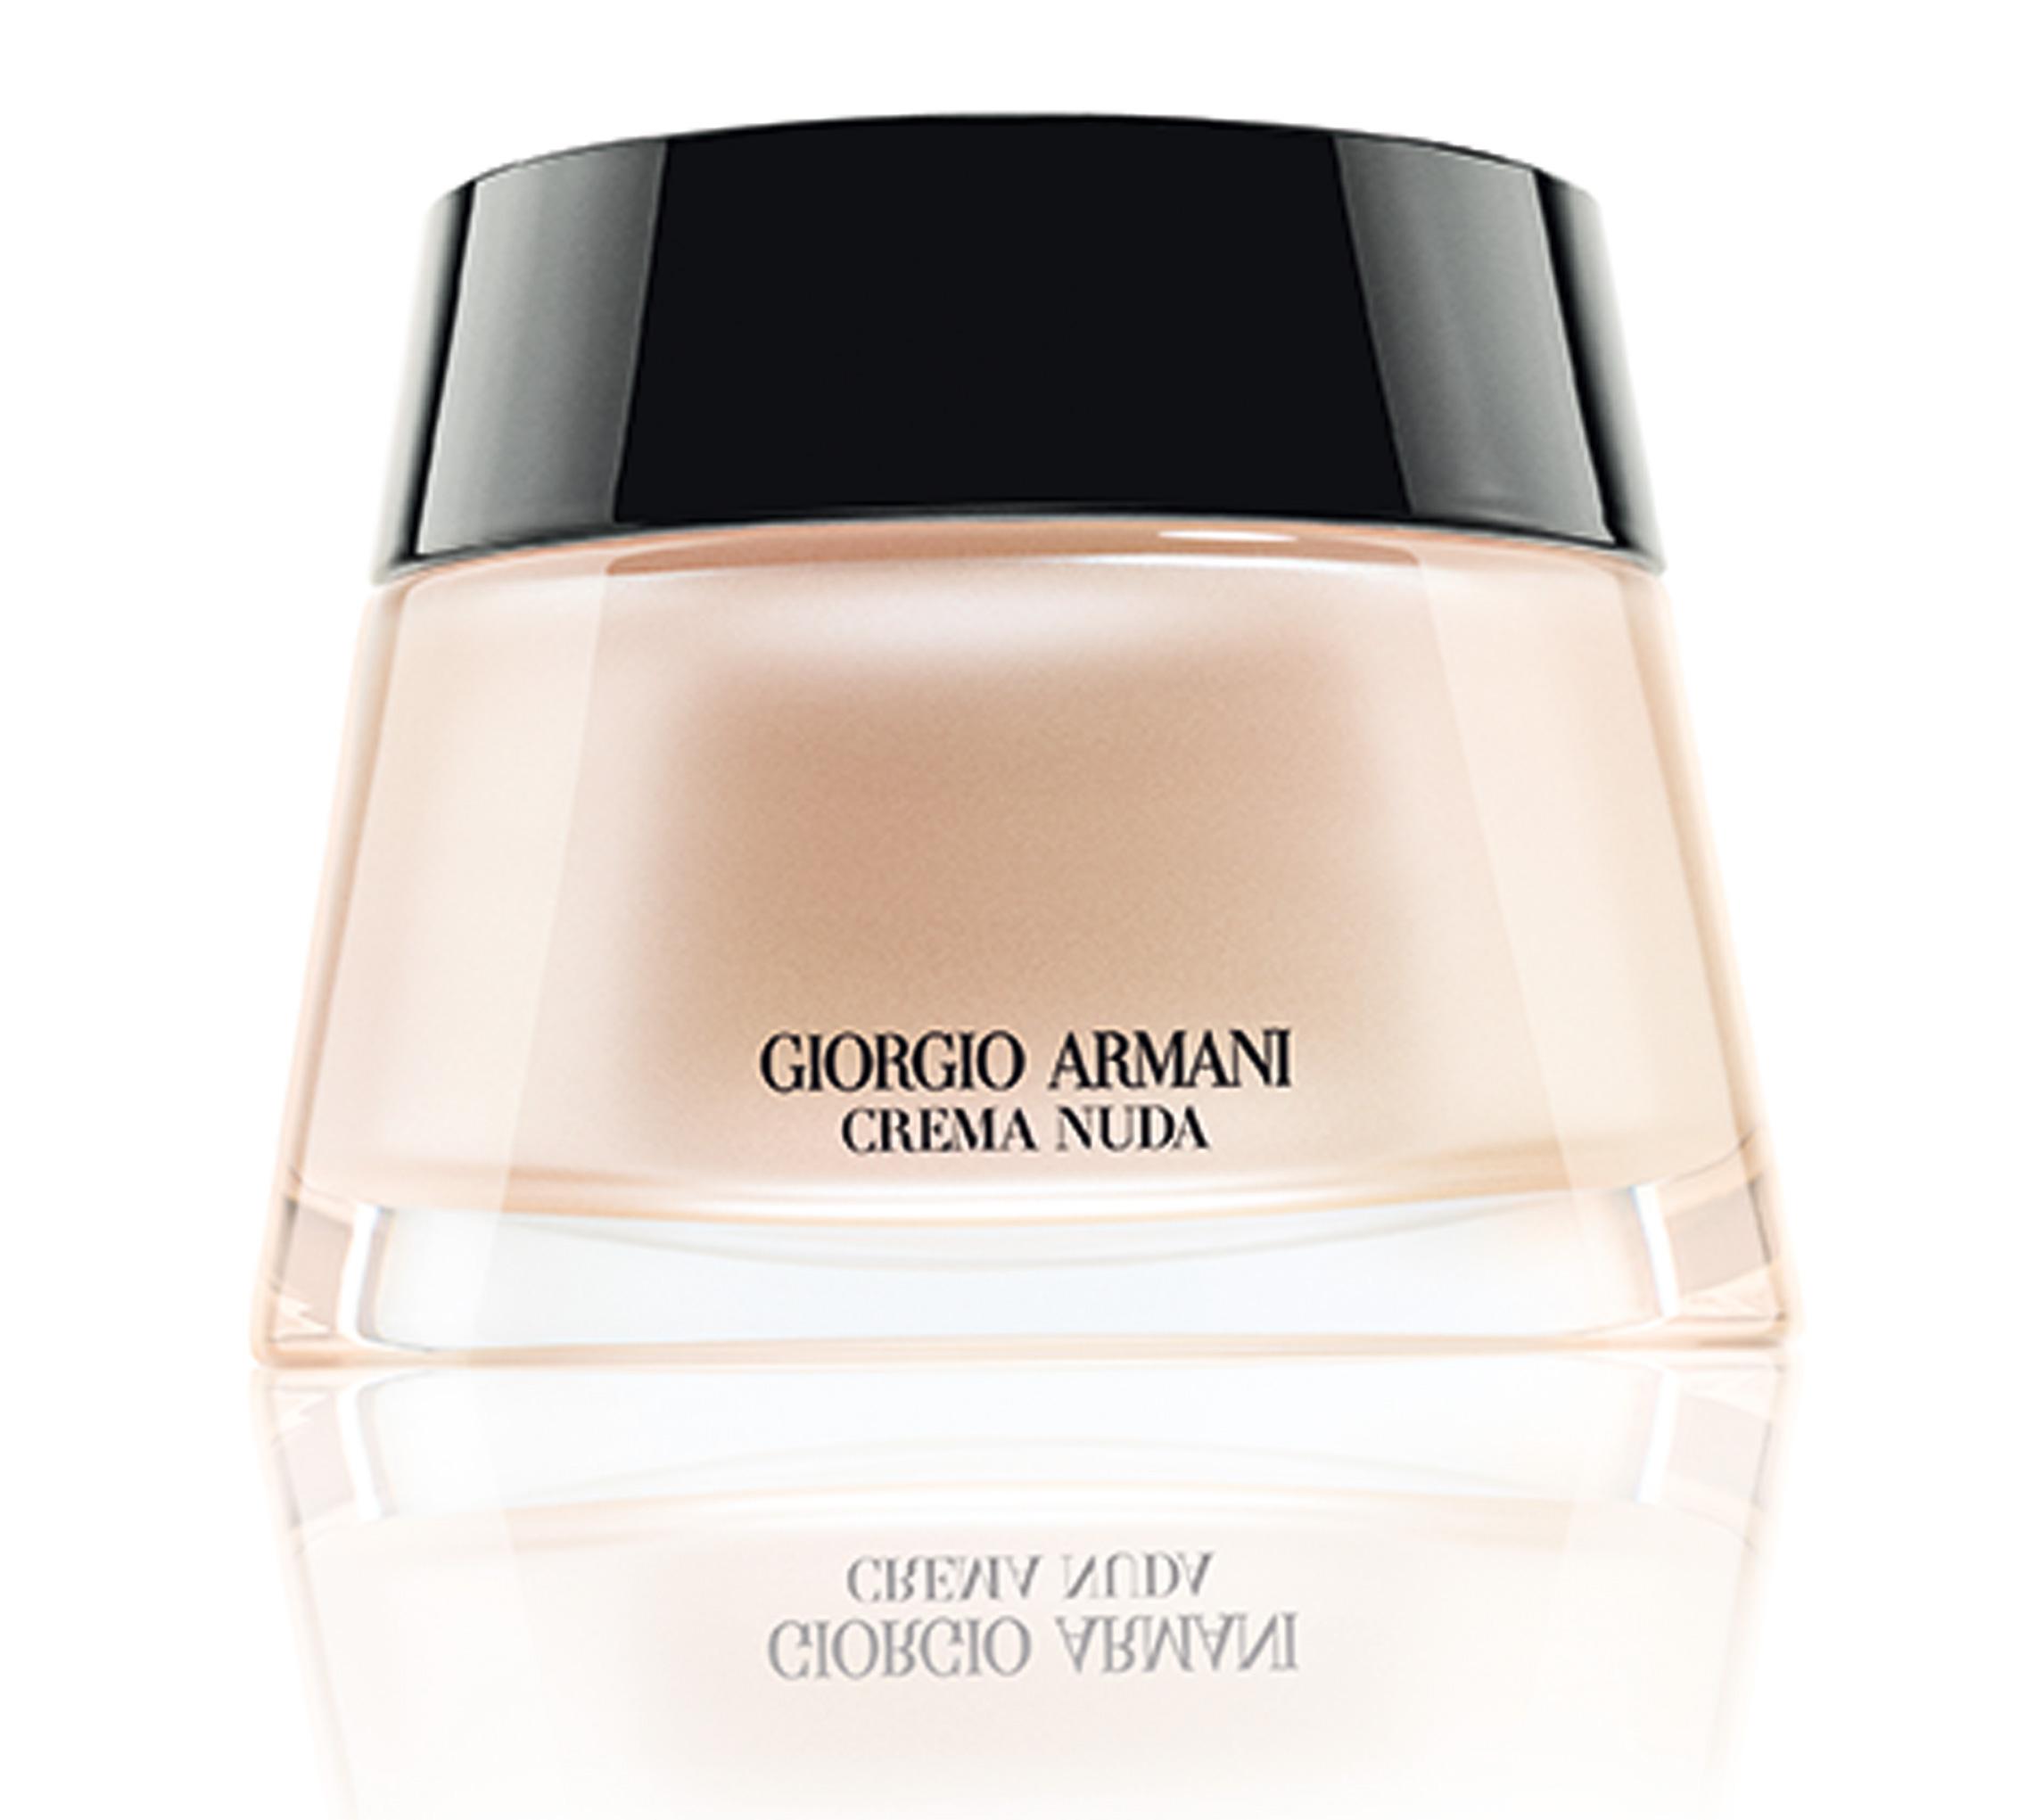 Crema Nuda by Giorgio Armani Beauty